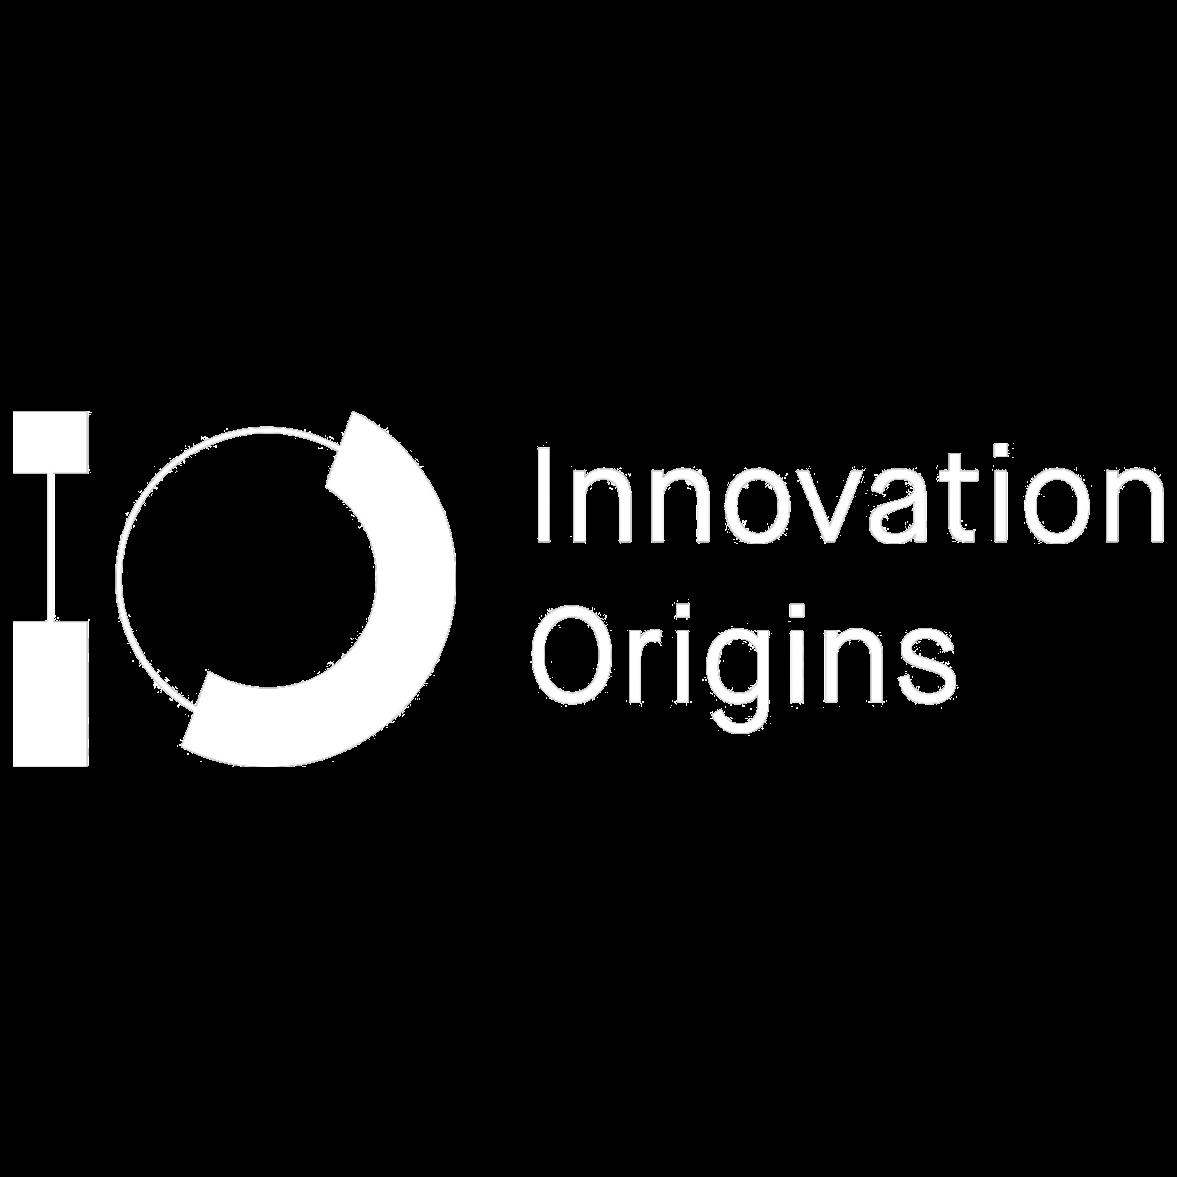 Innovation Origins - Vivellio